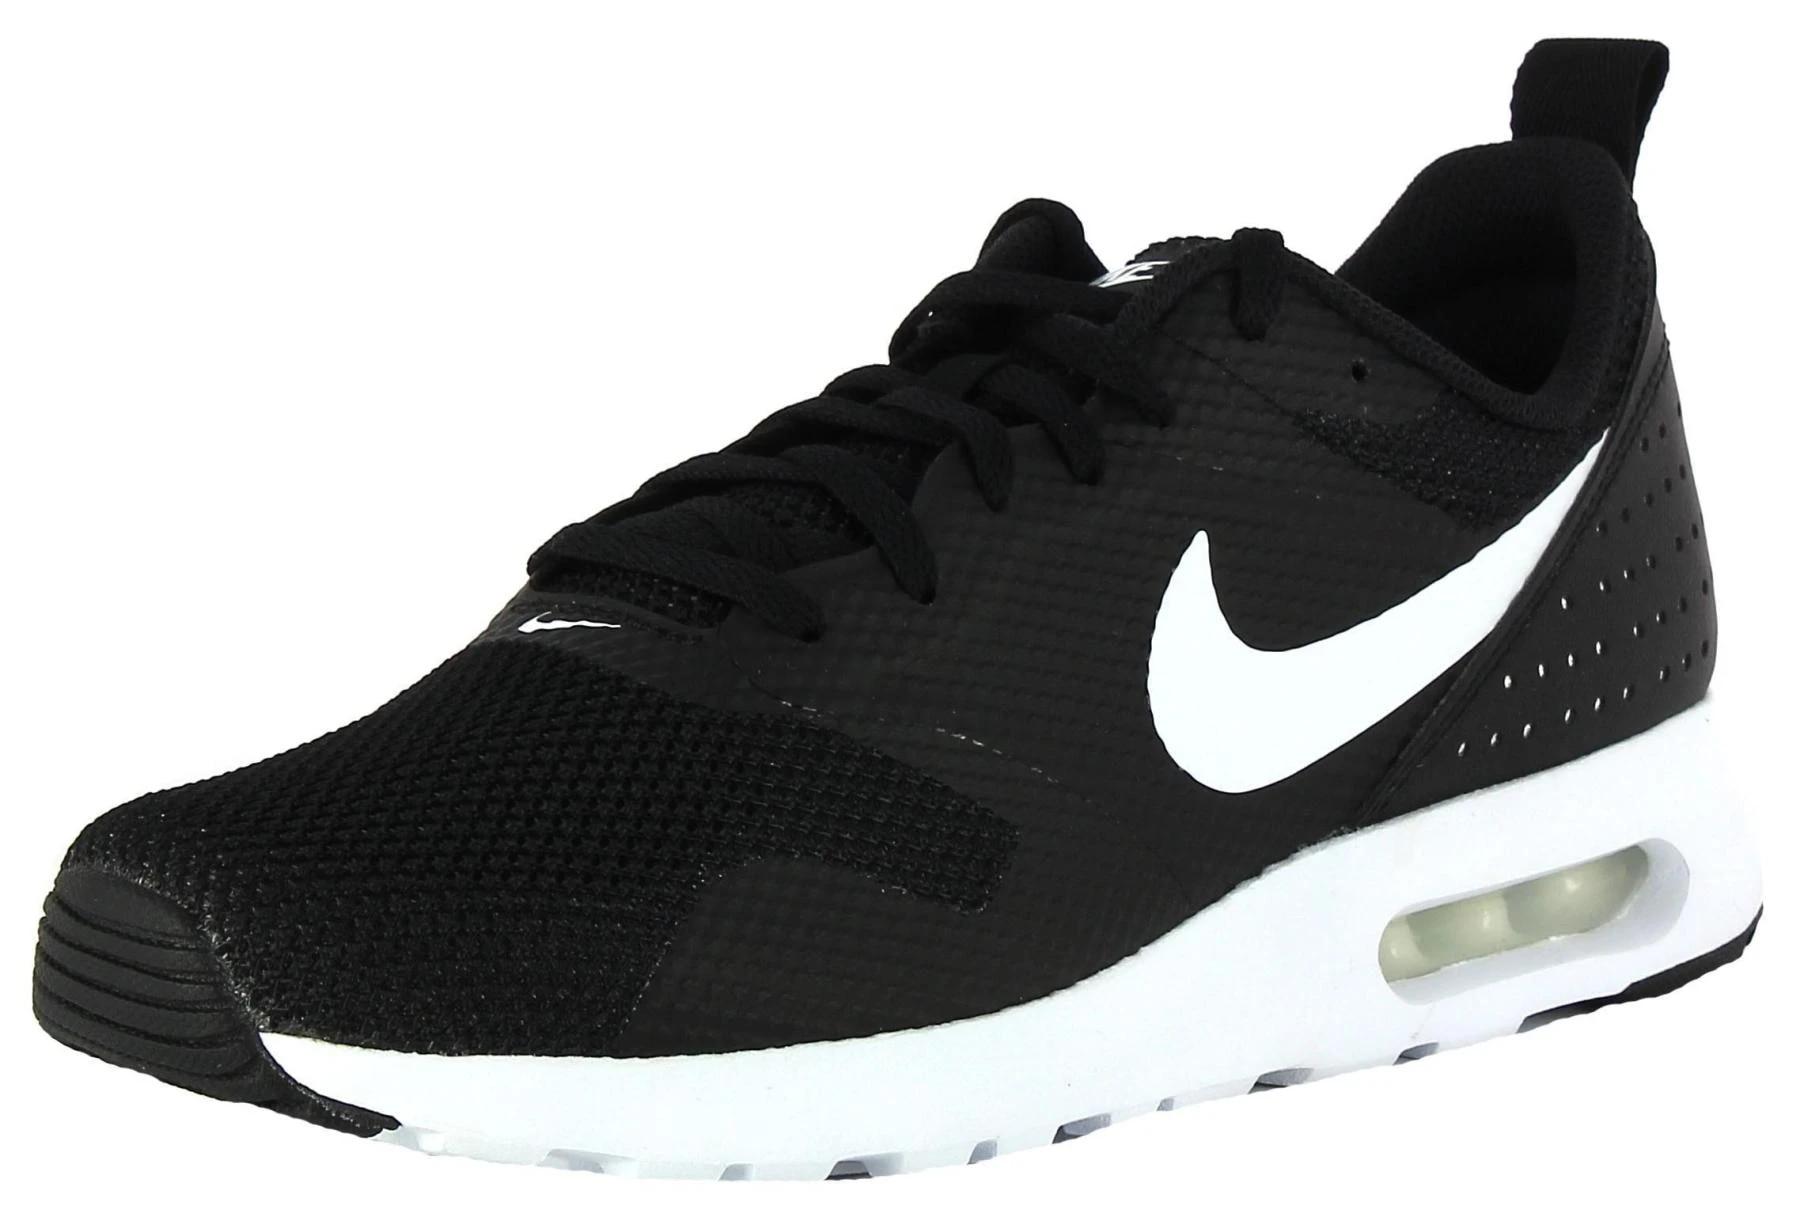 Gaviota cortar Será  Nike Air Max Tavas Sport Shoes Man|Walking Shoes| - AliExpress